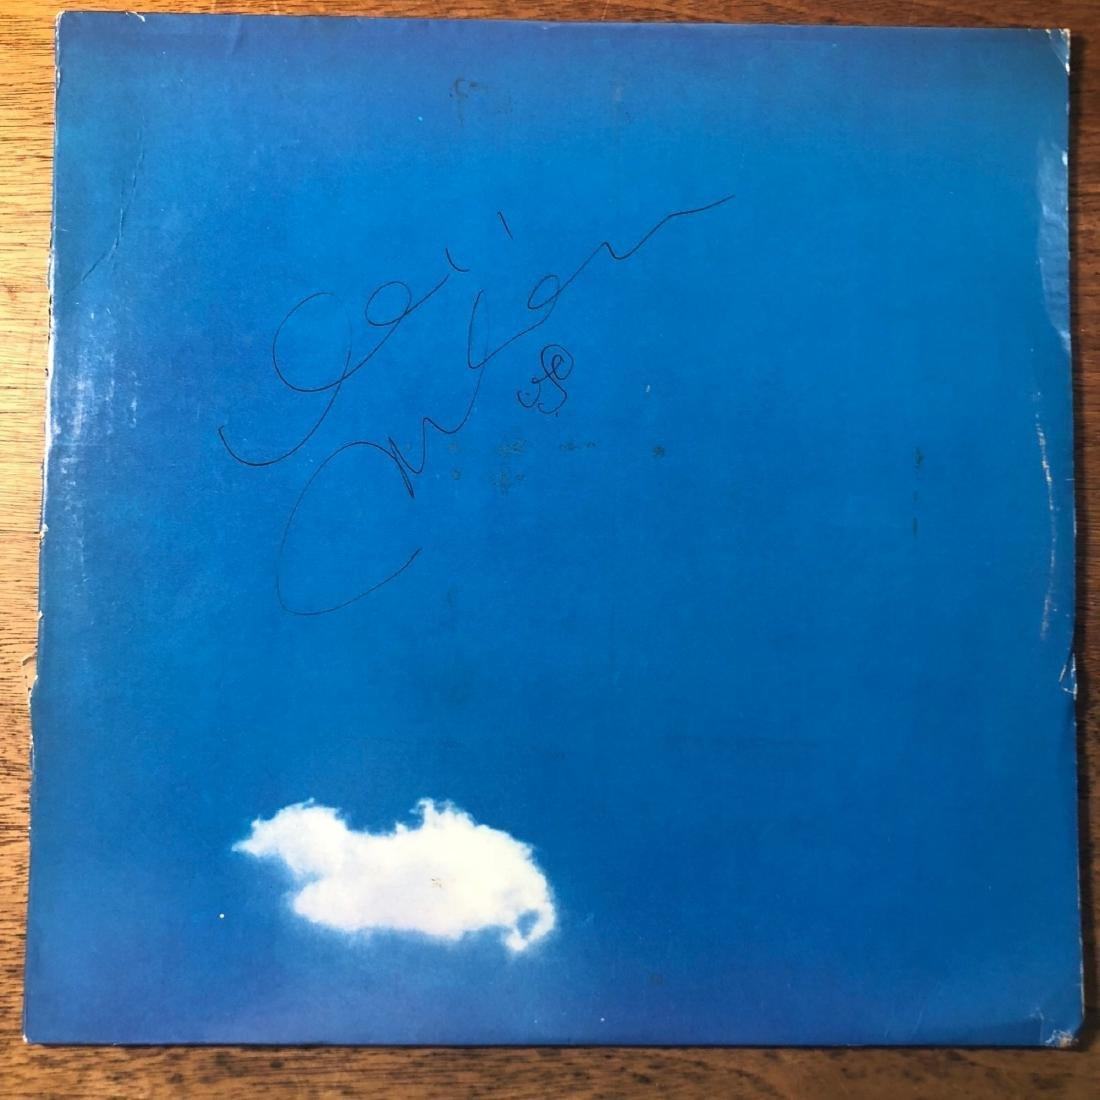 Signed Plastic Ono Band (John Lennon) Album